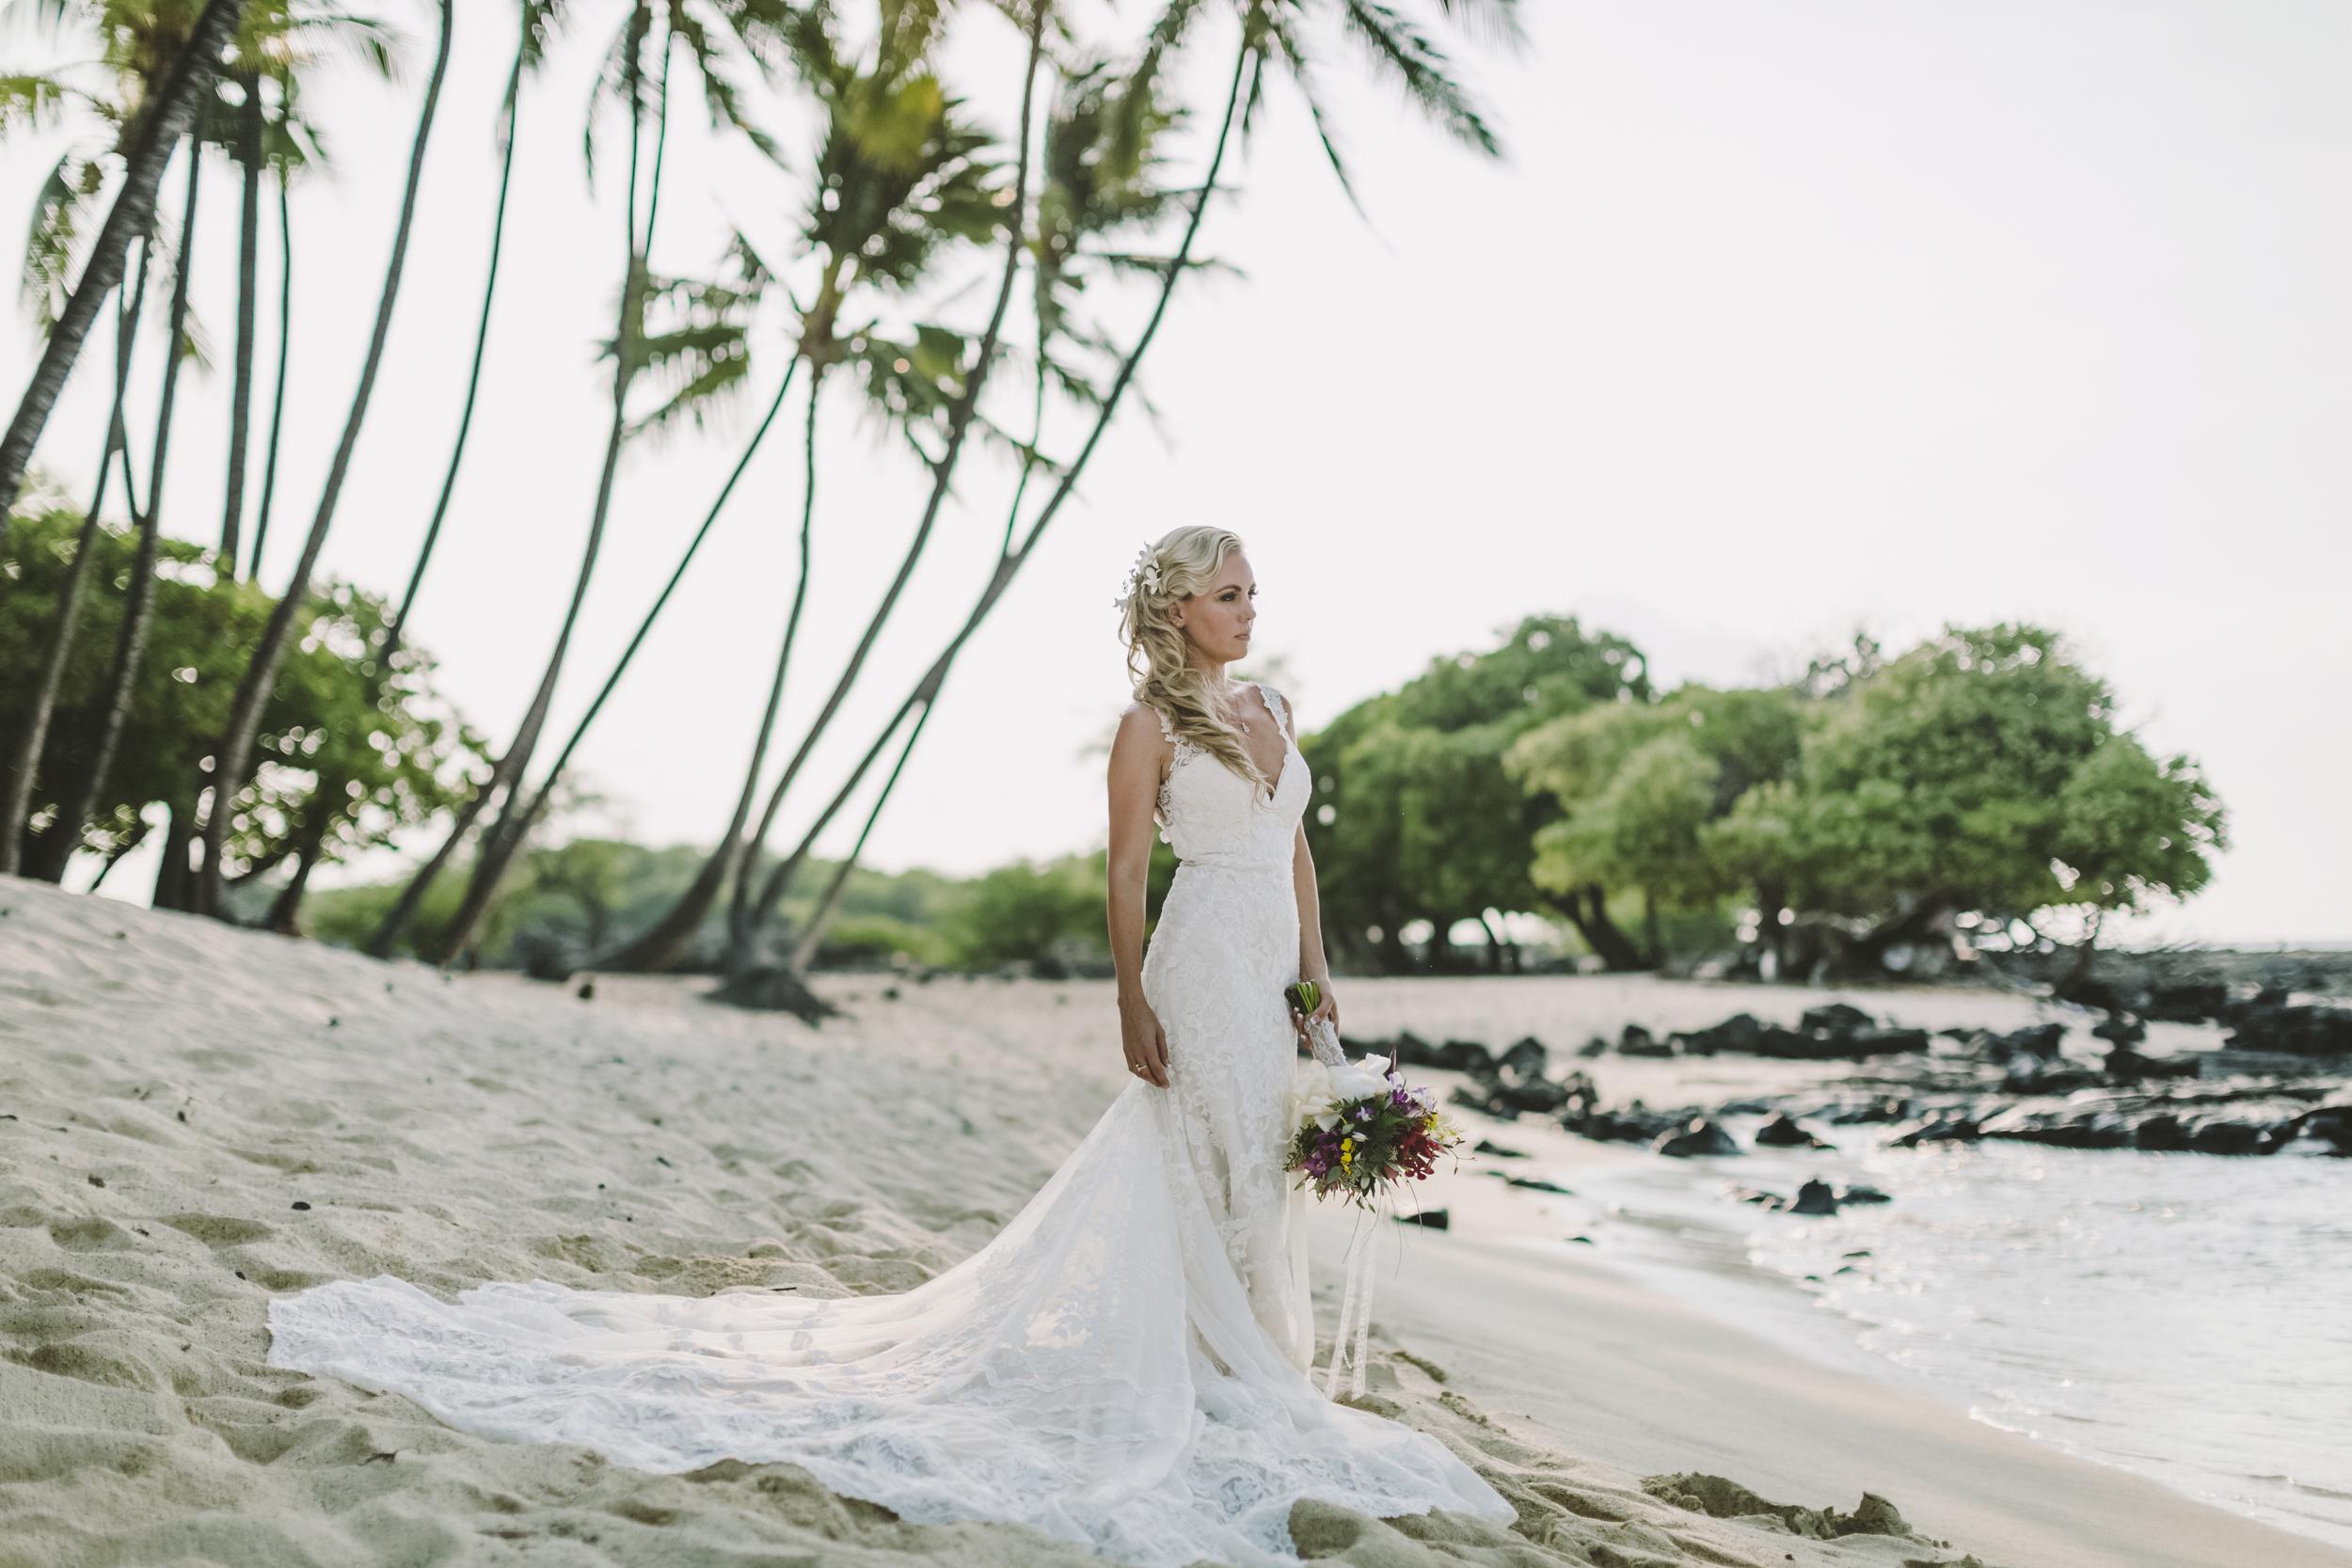 angie-diaz-photography-hawaii-wedding-photographer-kelli-jay-89.jpg